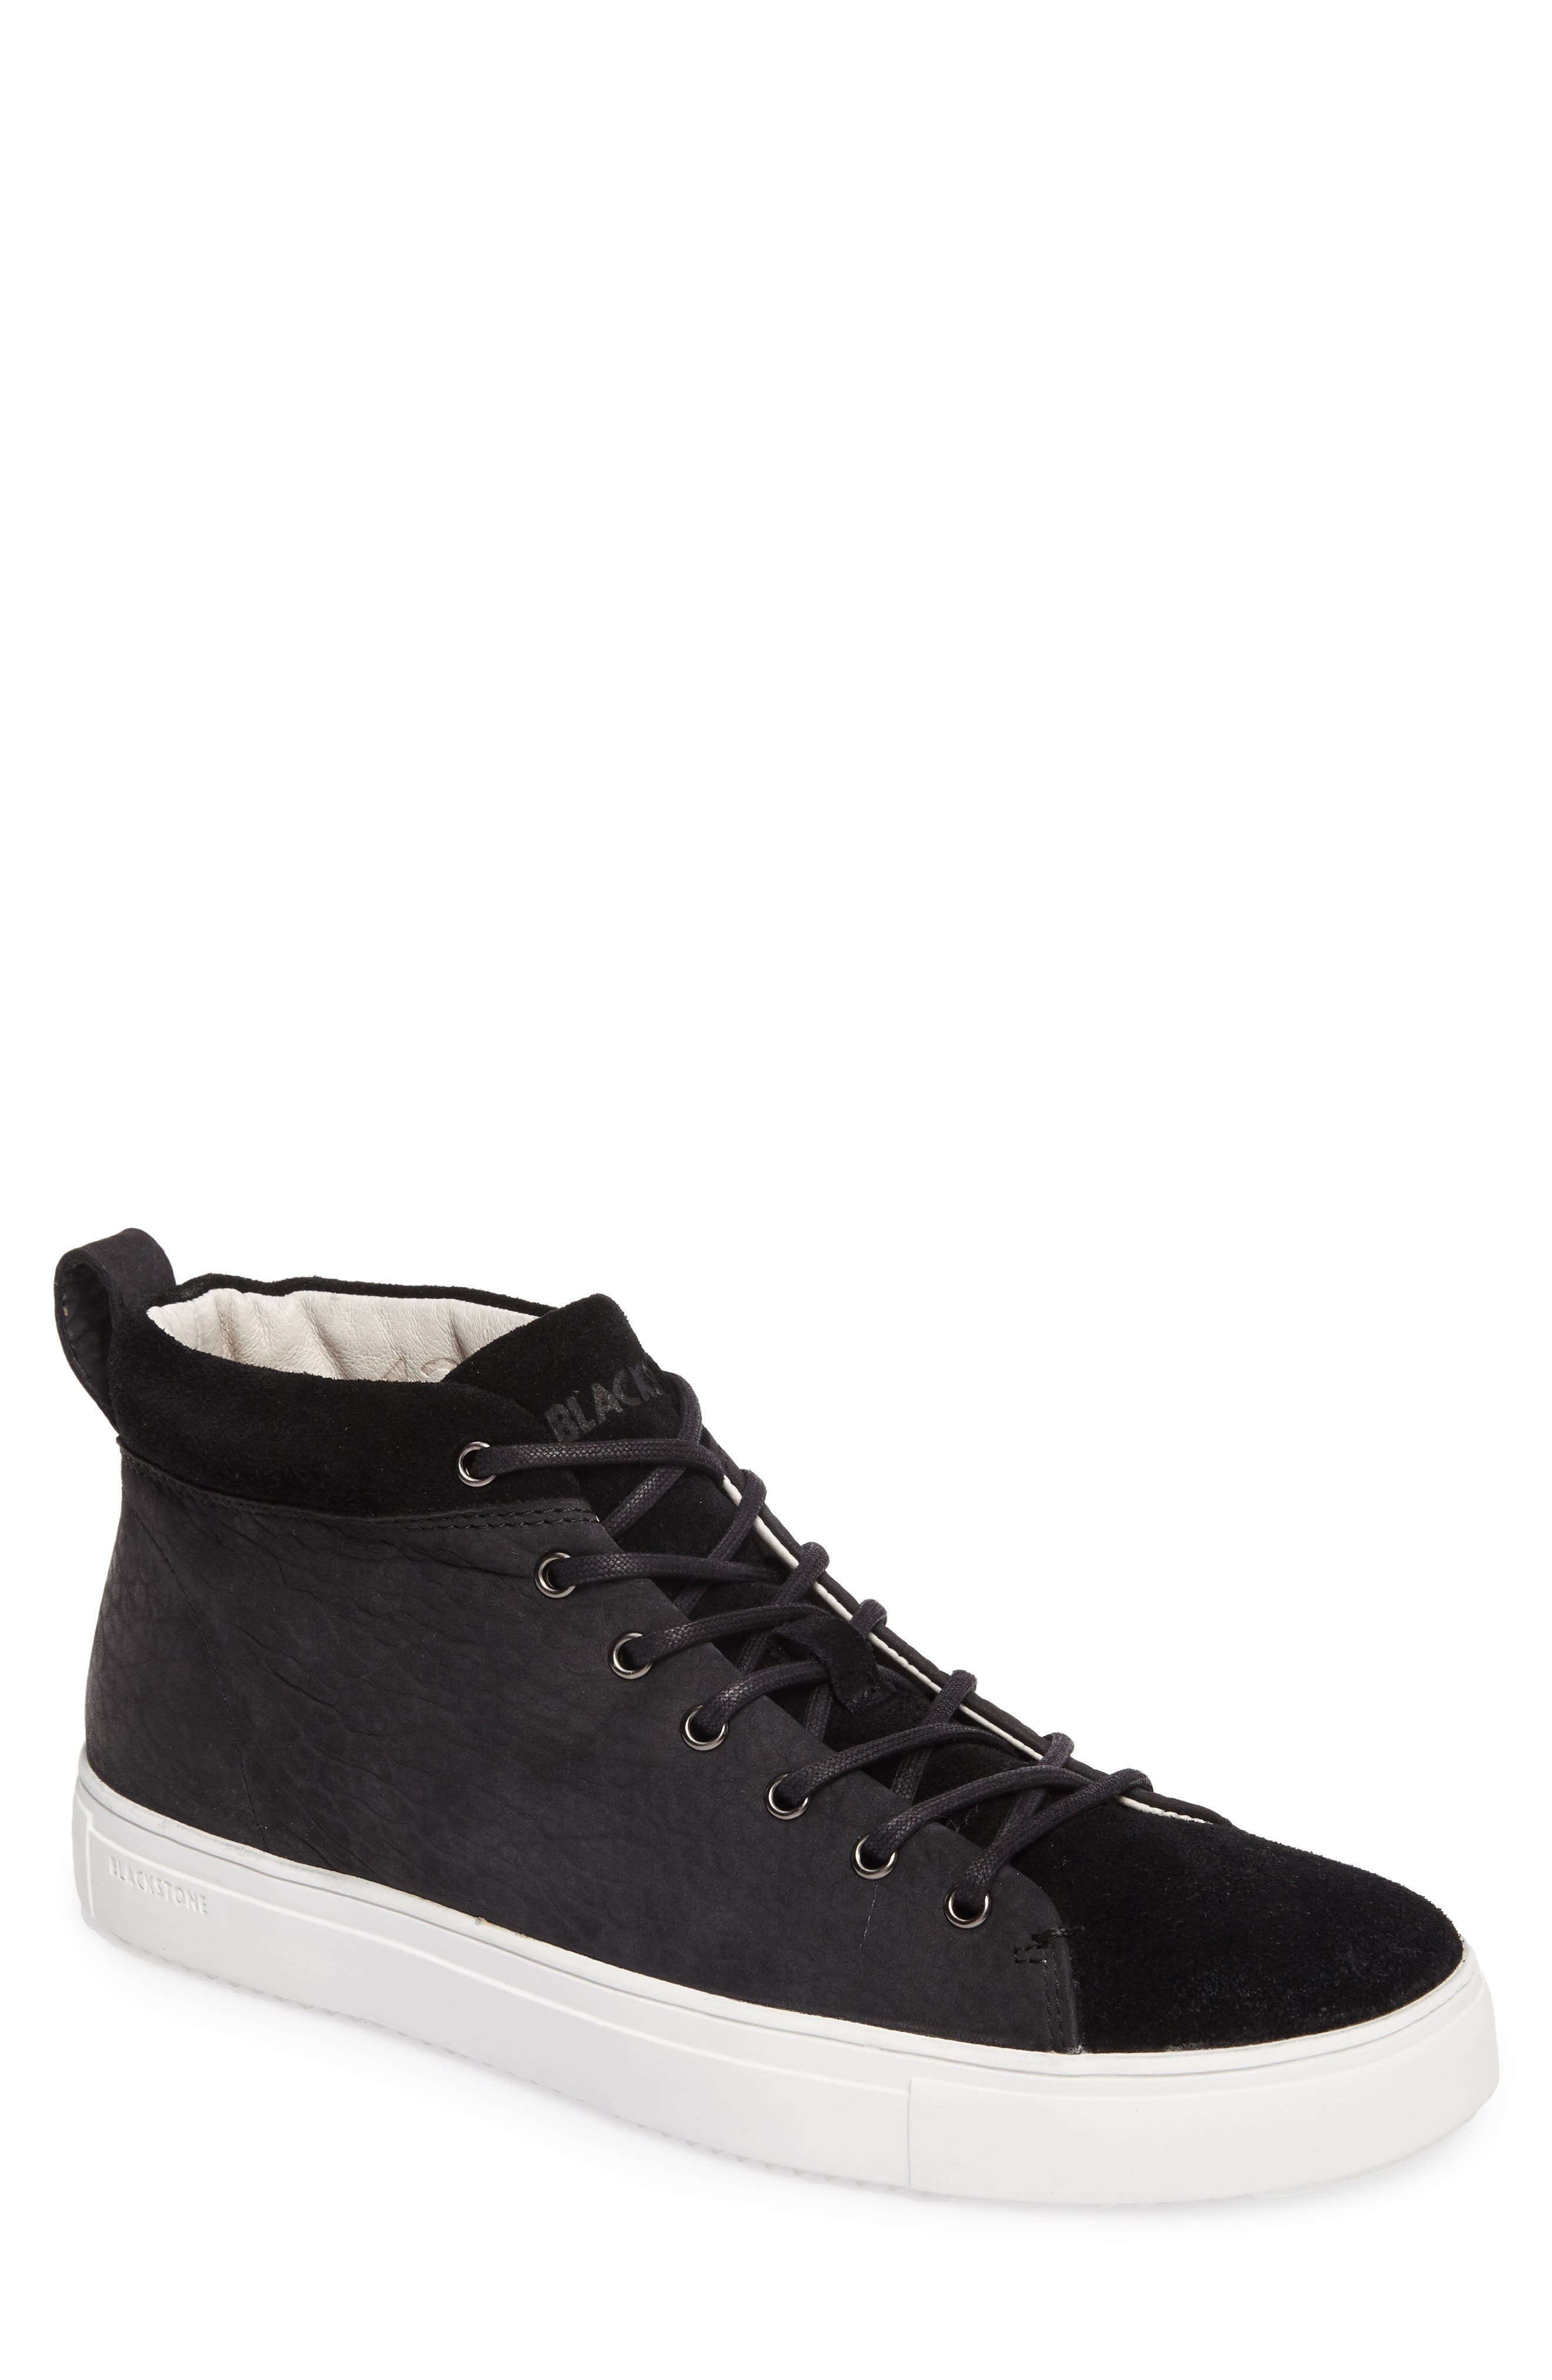 OM 56 Sneaker,                             Main thumbnail 1, color,                             BLACK LEATHER